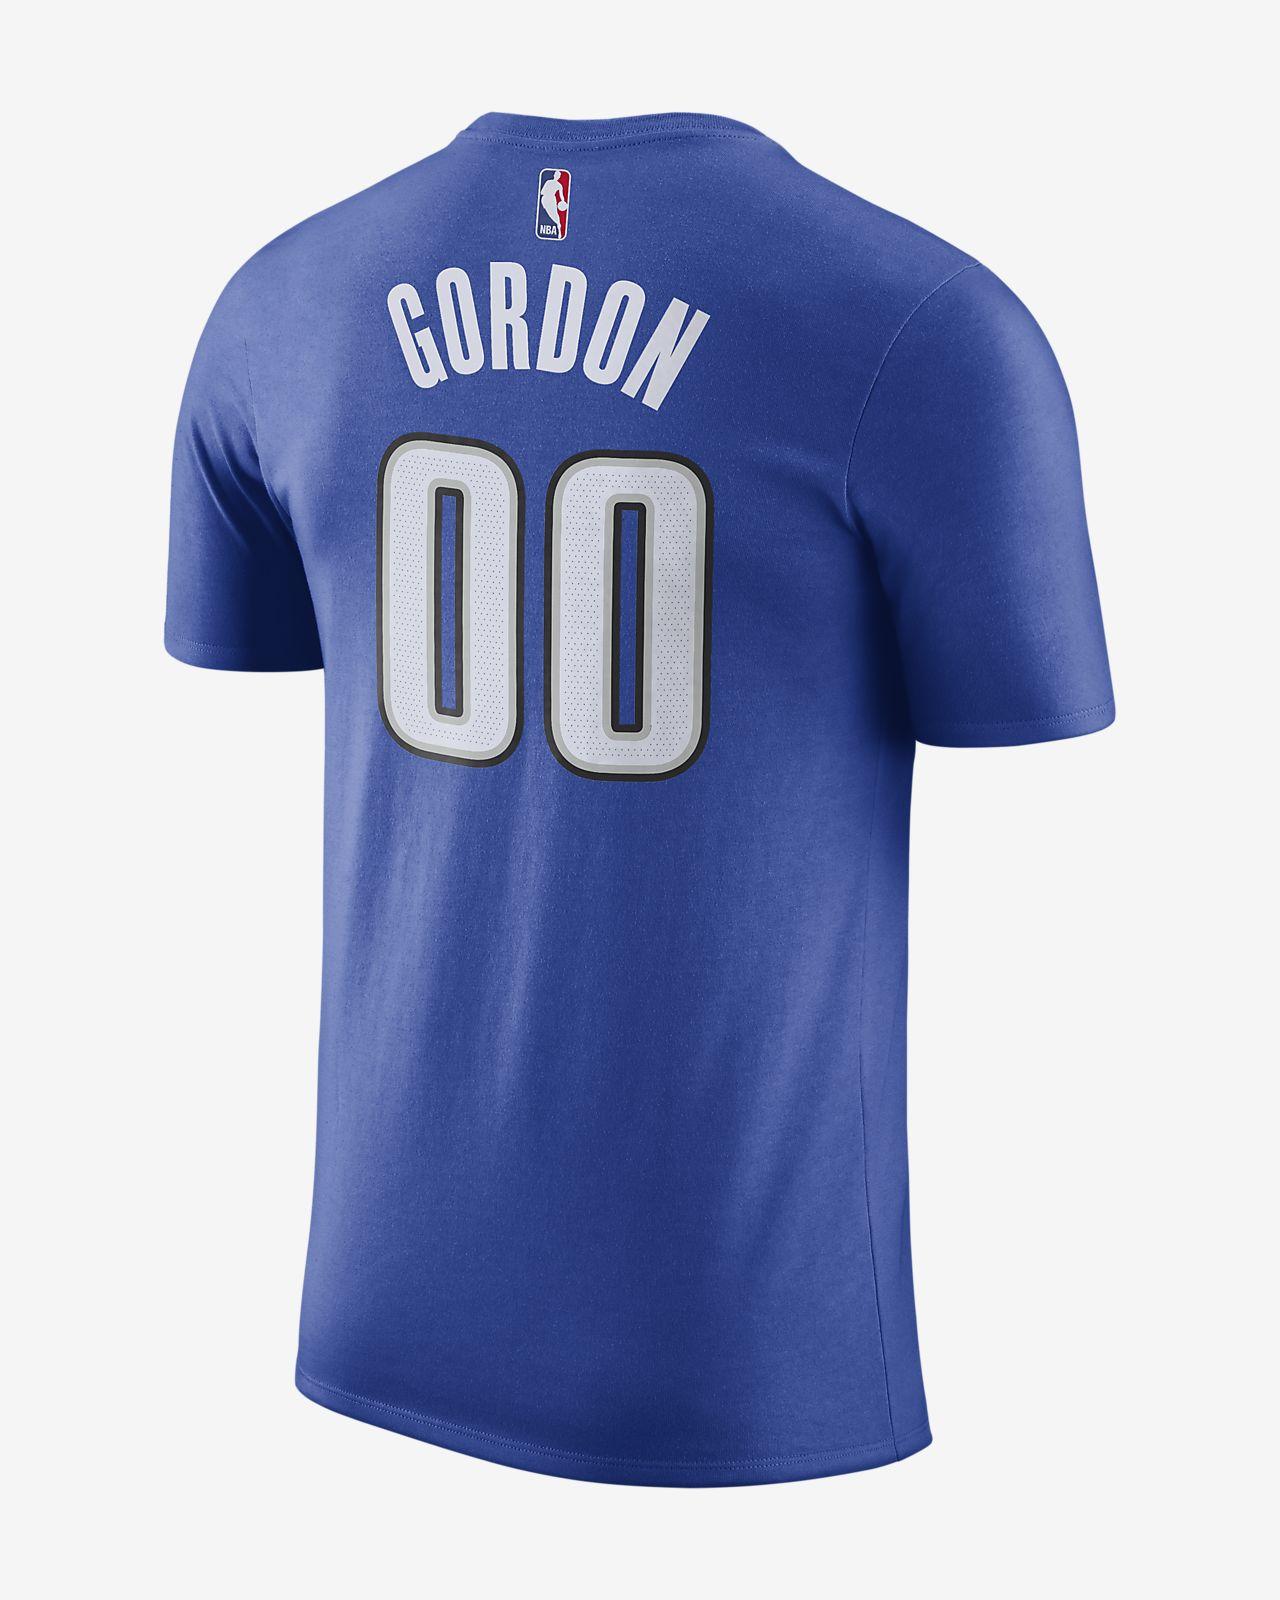 the best attitude 460f5 c595e Aaron Gordon Orlando Magic Nike Dri-FIT Men's NBA T-Shirt